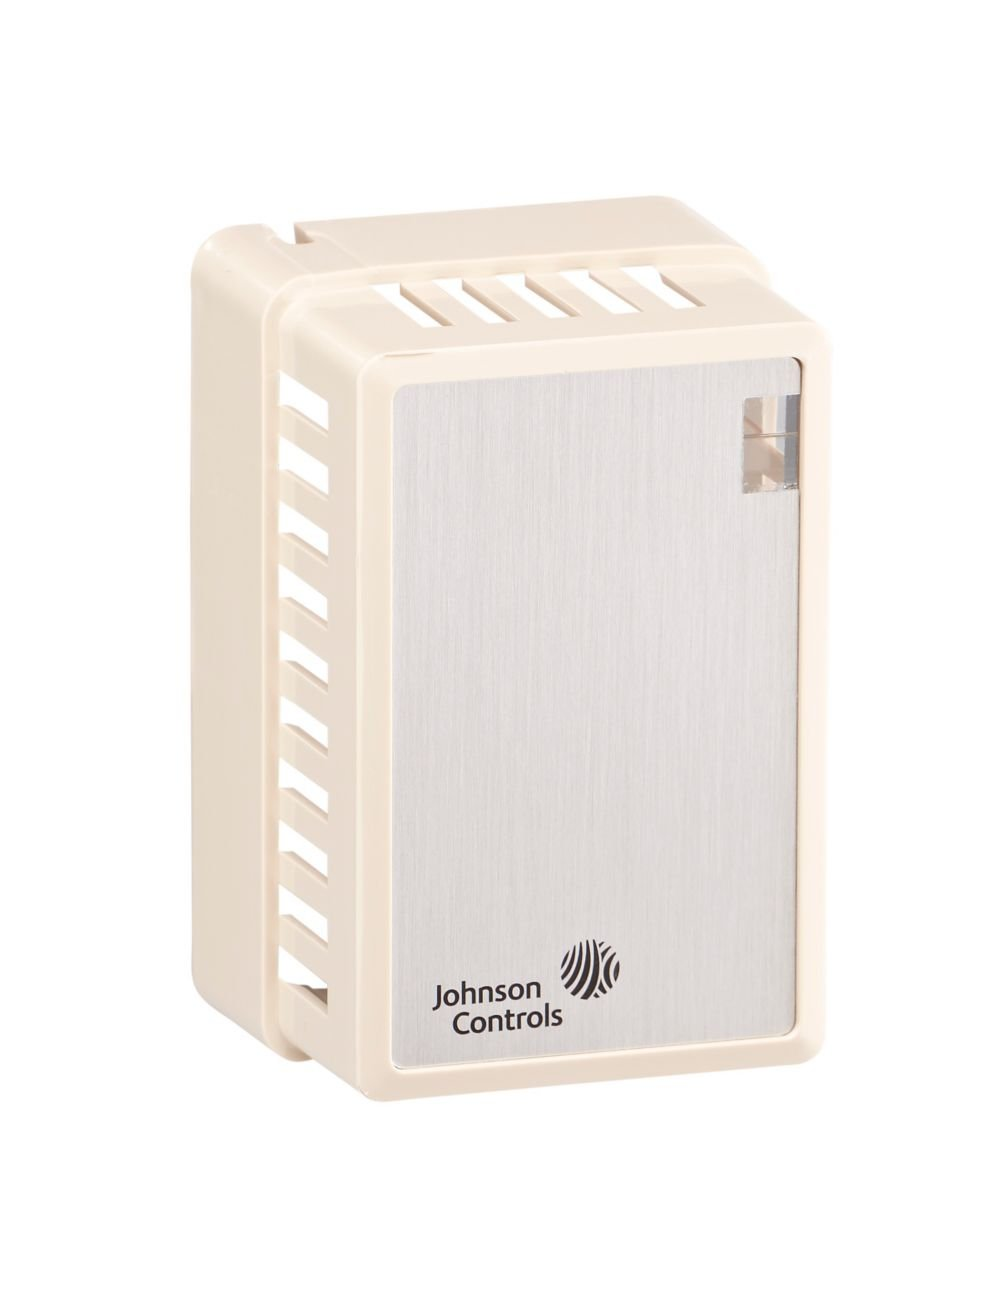 Beige Johnson Controls Inc Johnson Controls T-4000-2145 Pneumatic Thermostat Cover